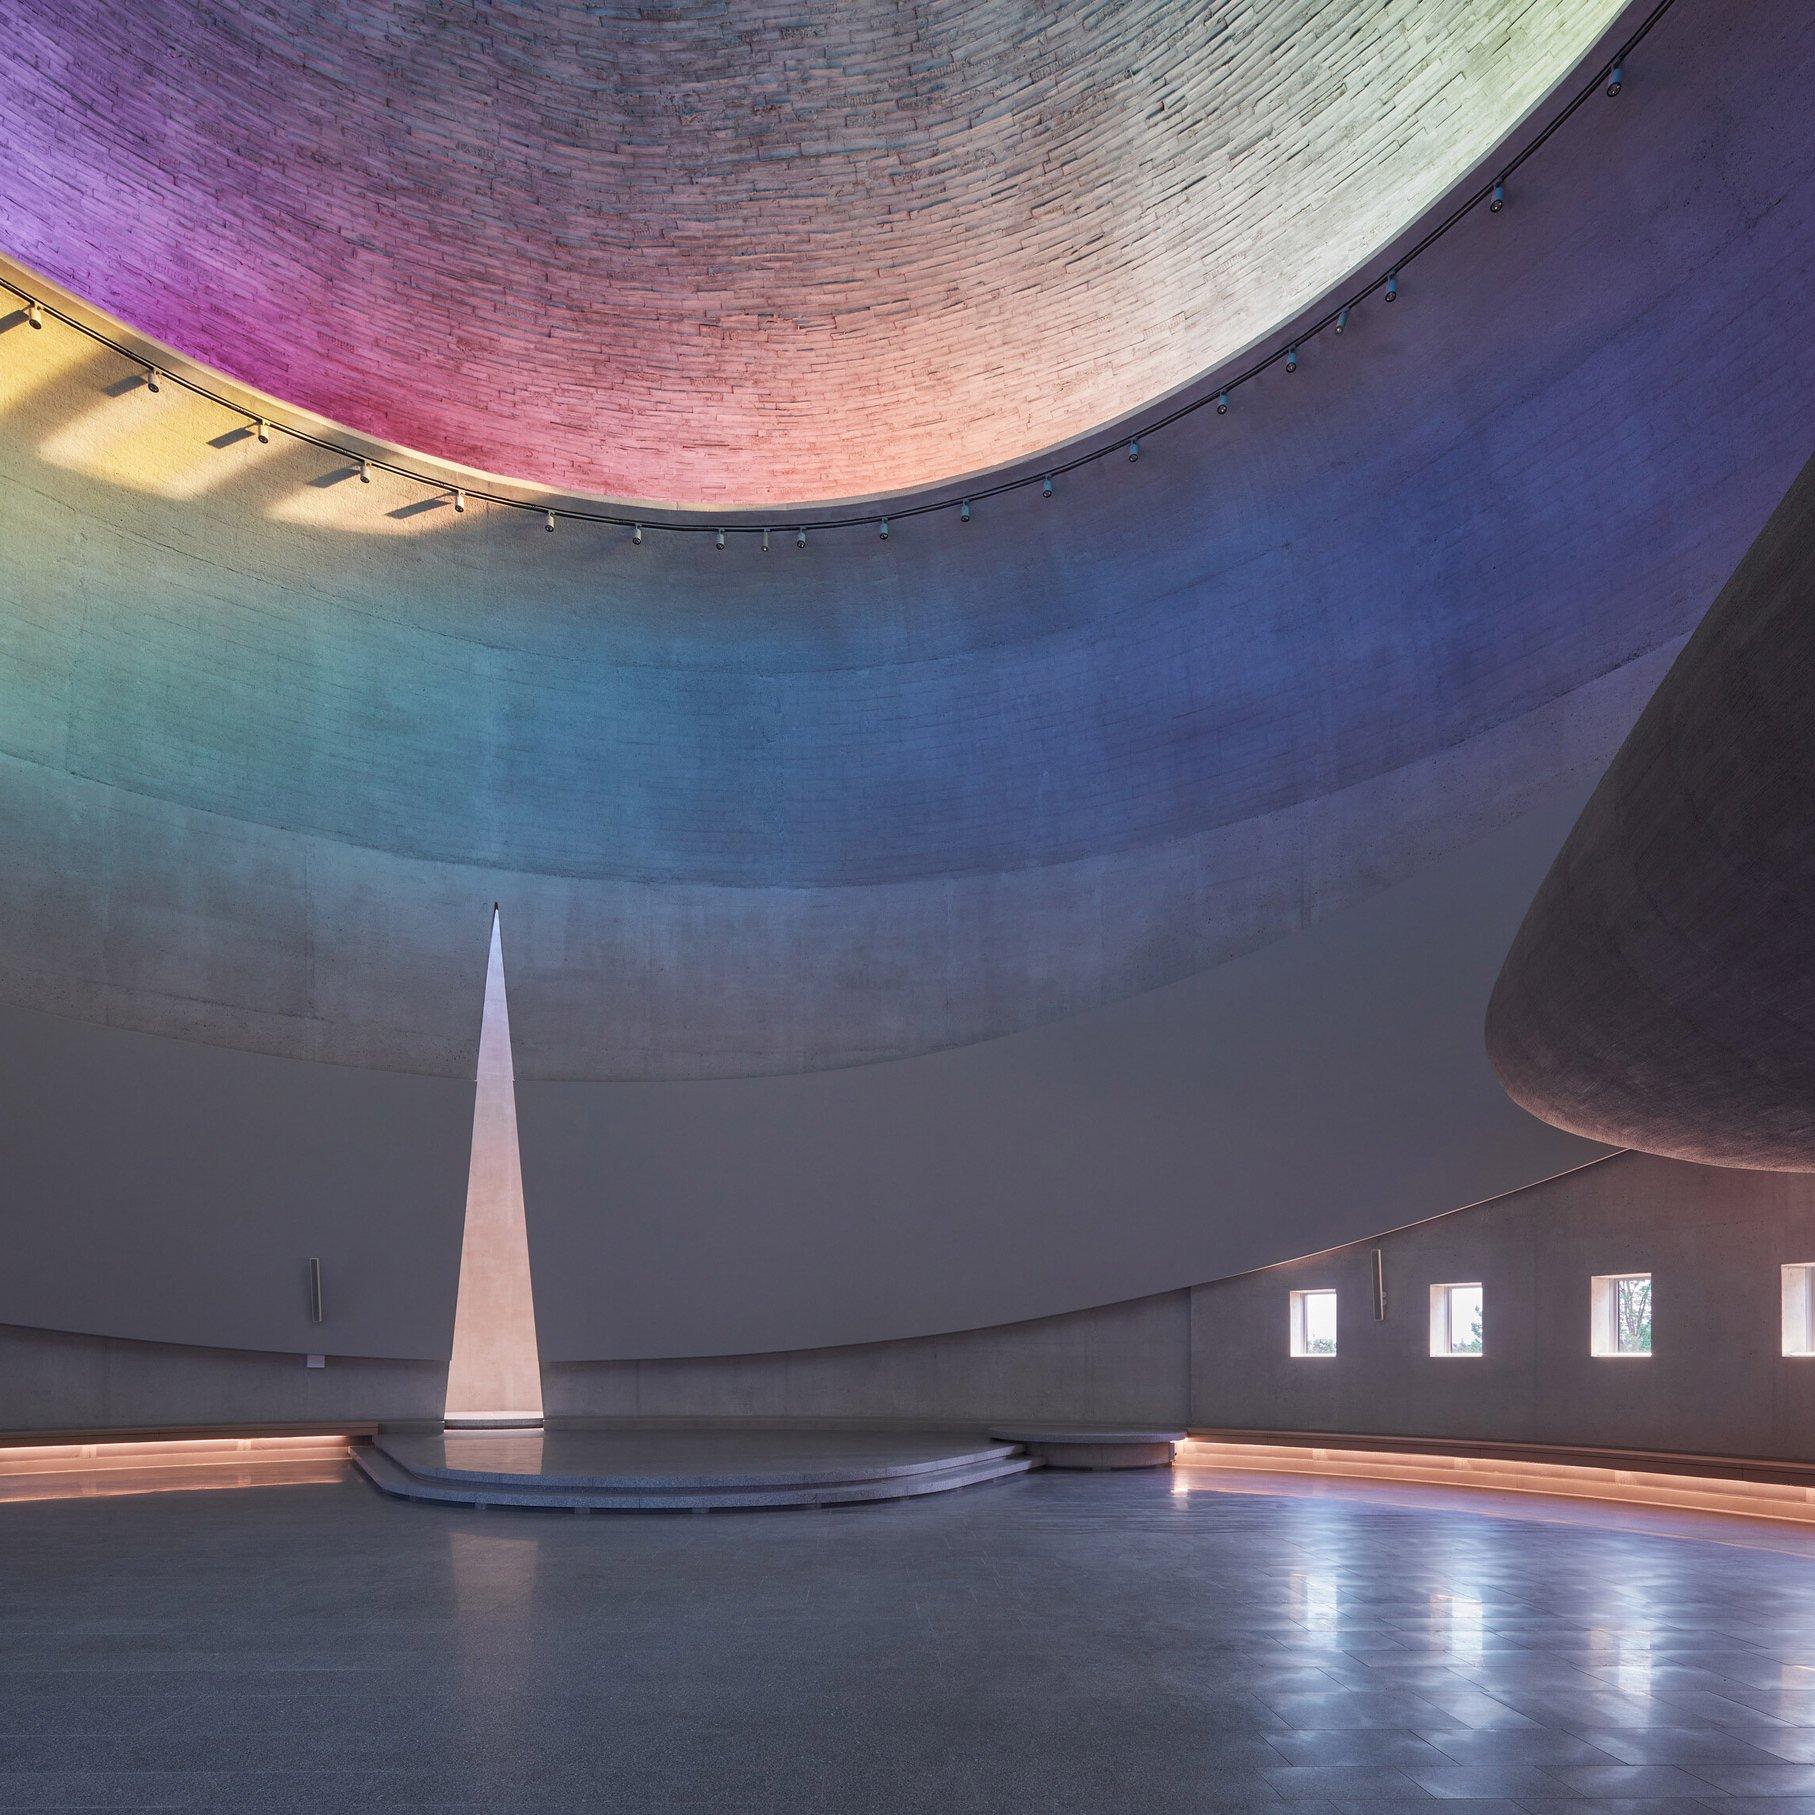 Church with rainbow roof light